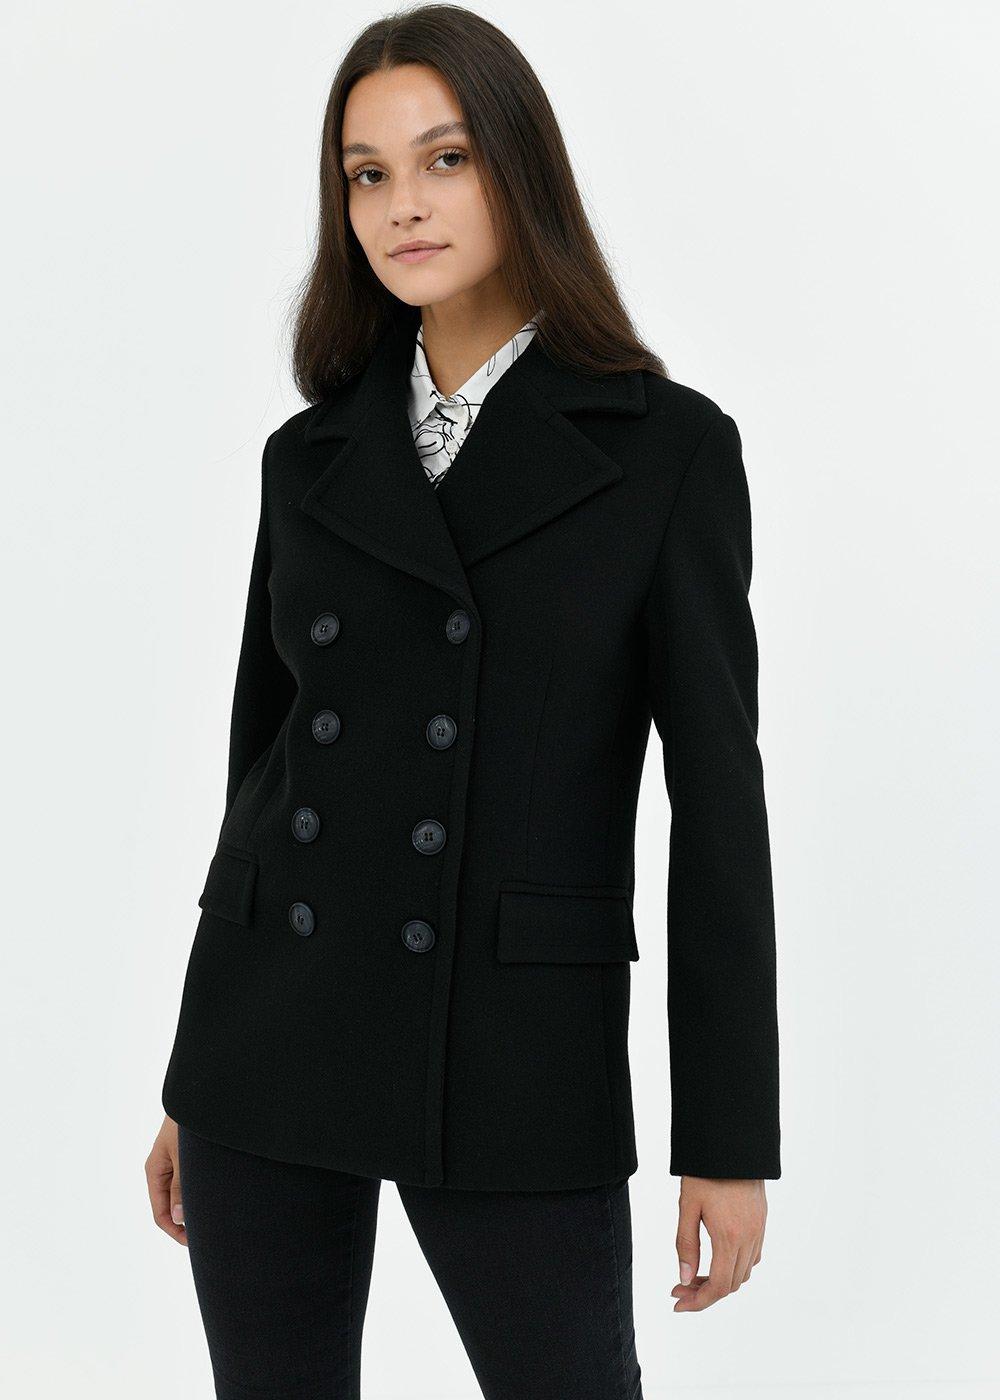 Ciril coat with lapel - Black - Woman